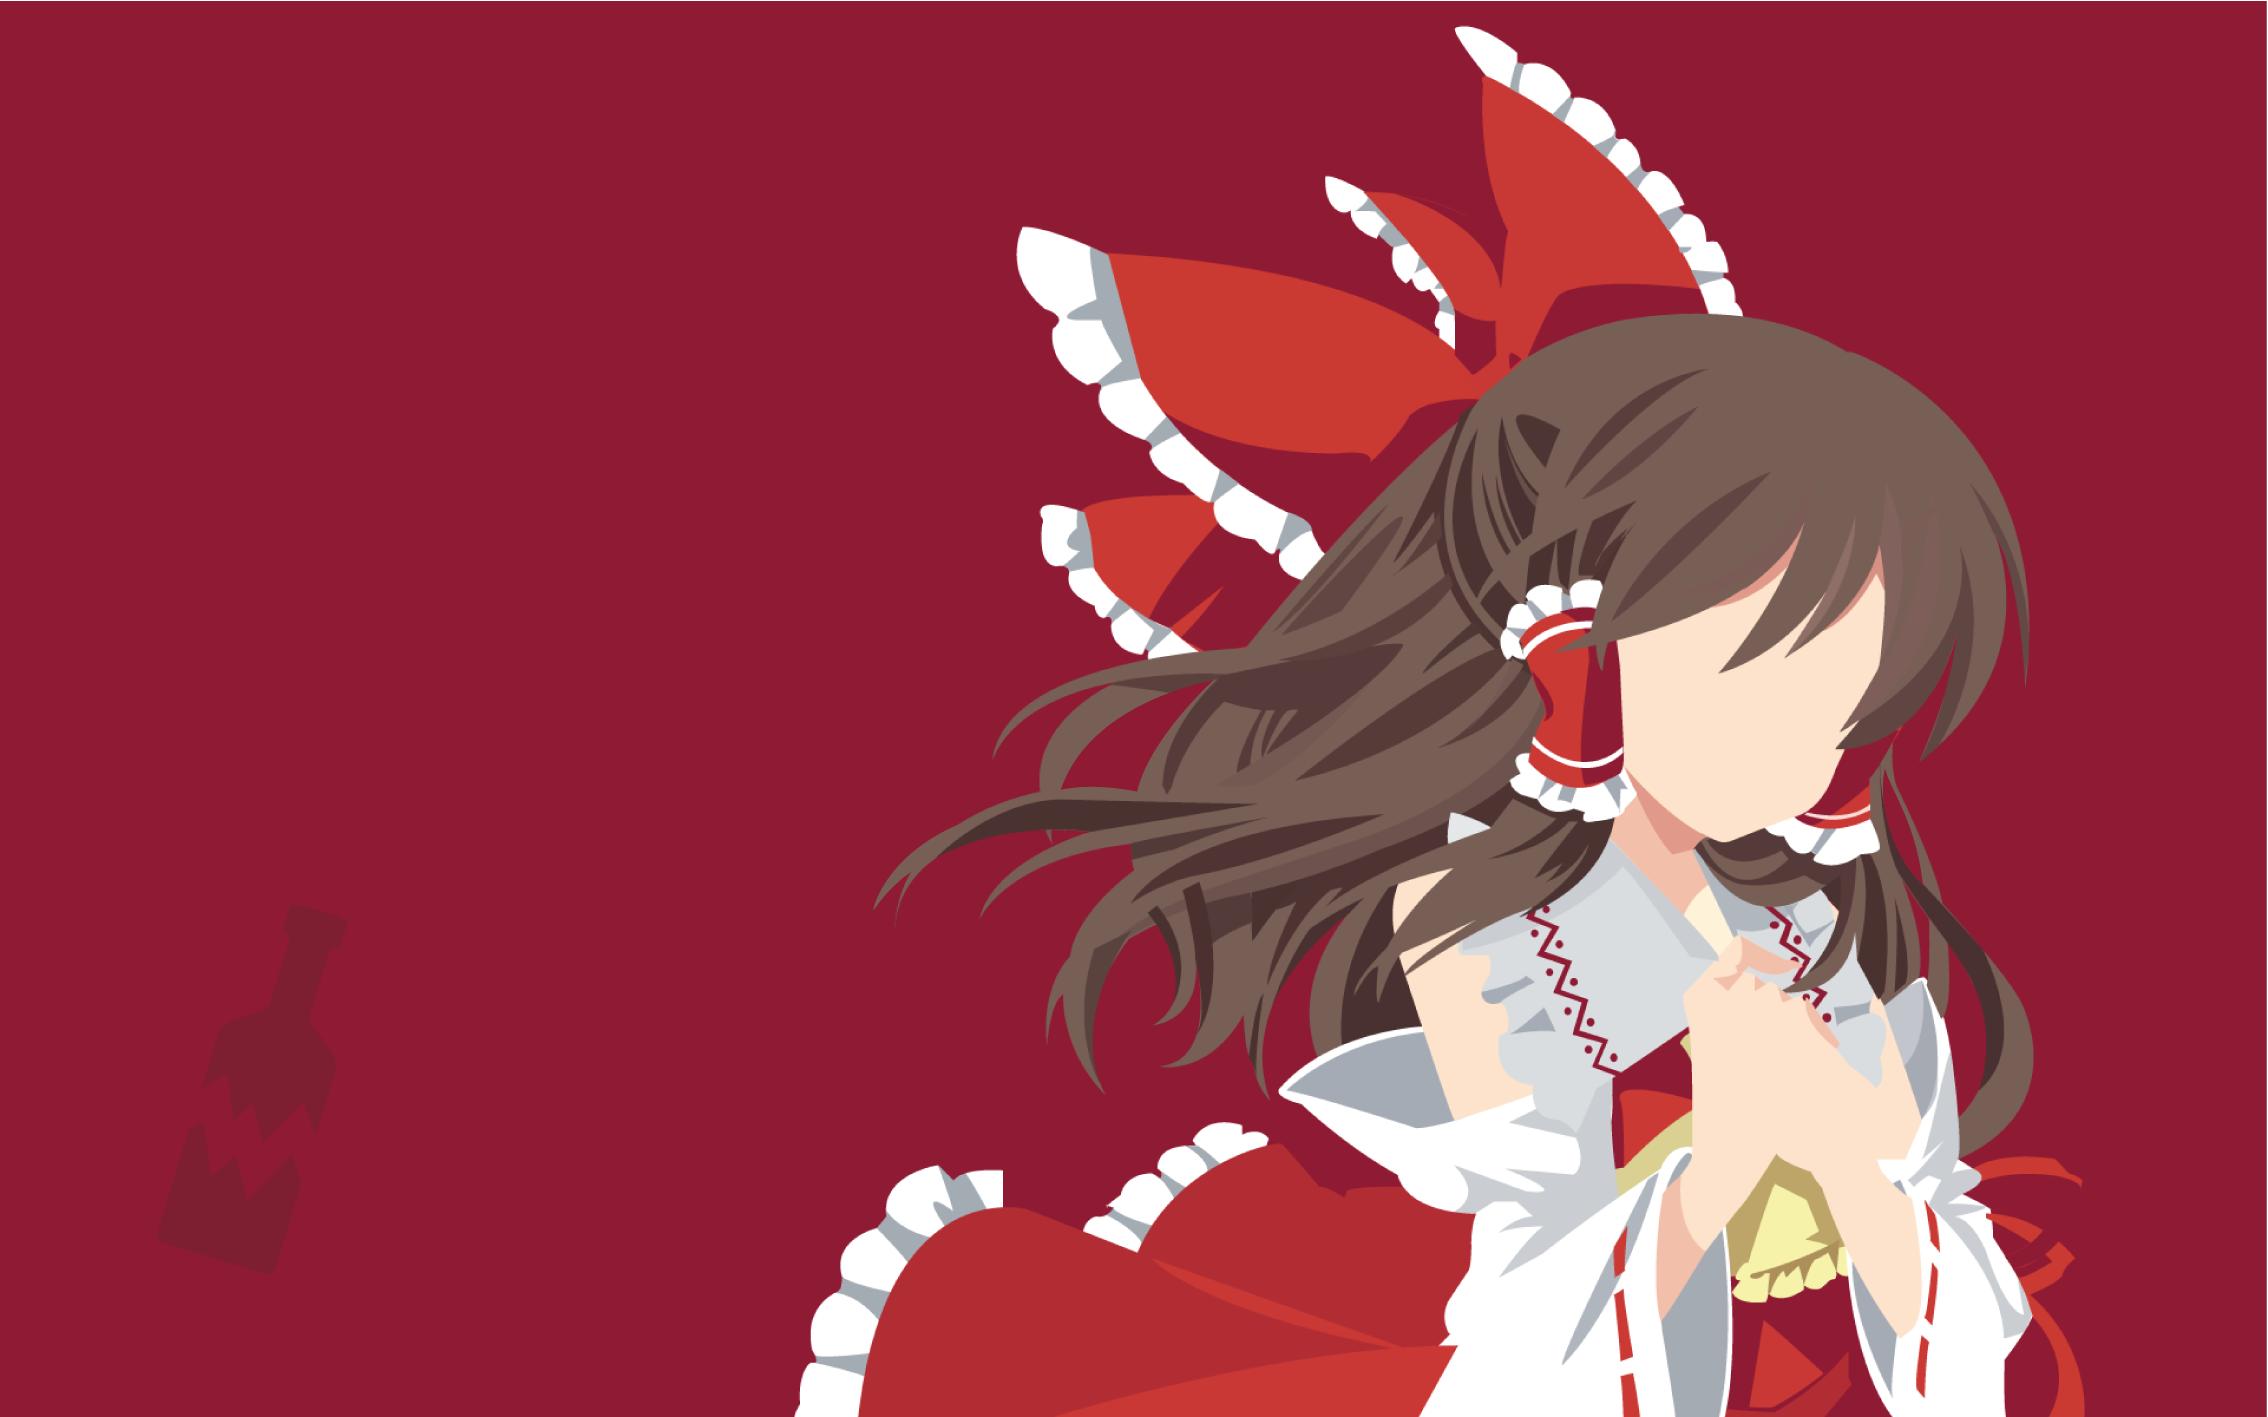 Touhou Project - Reimu Hakurei by TheBrokenBottle